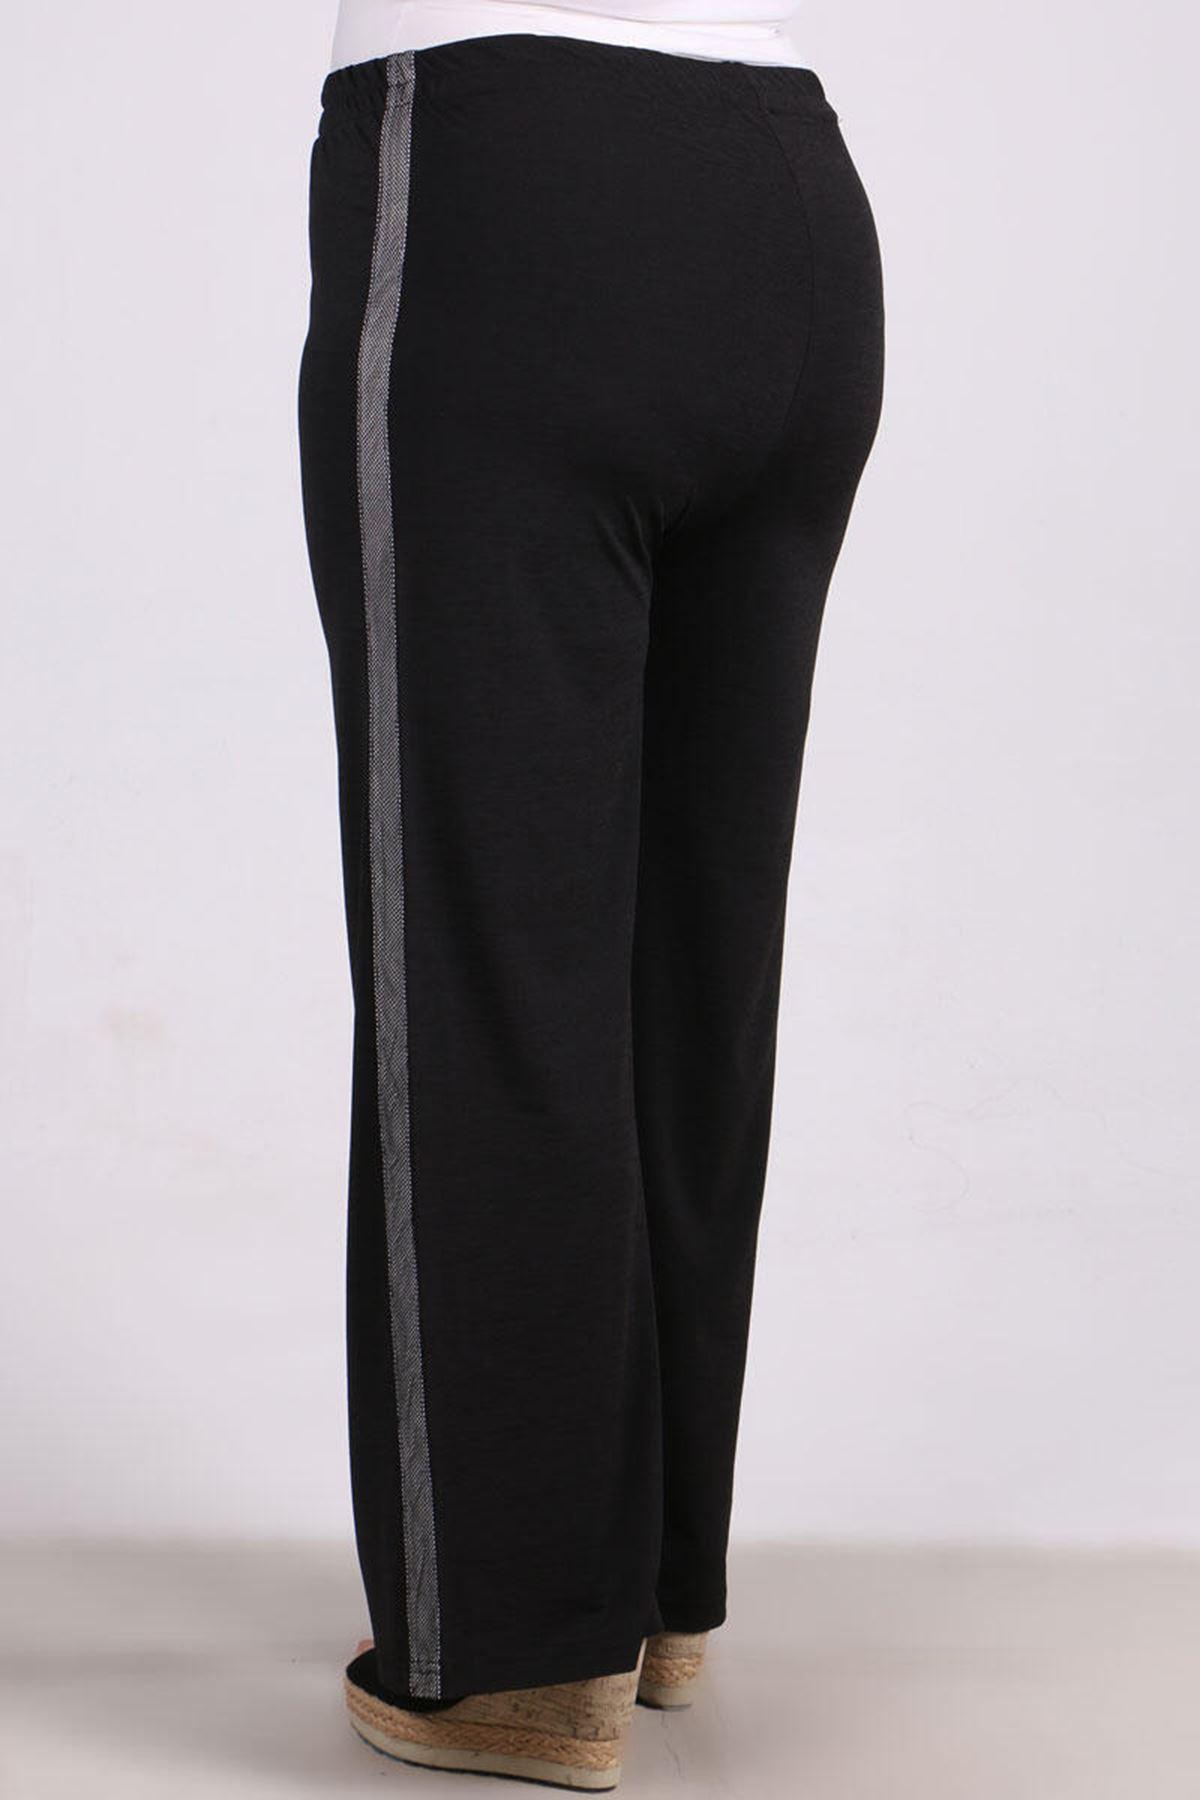 9141 Plus Size Pants - Black